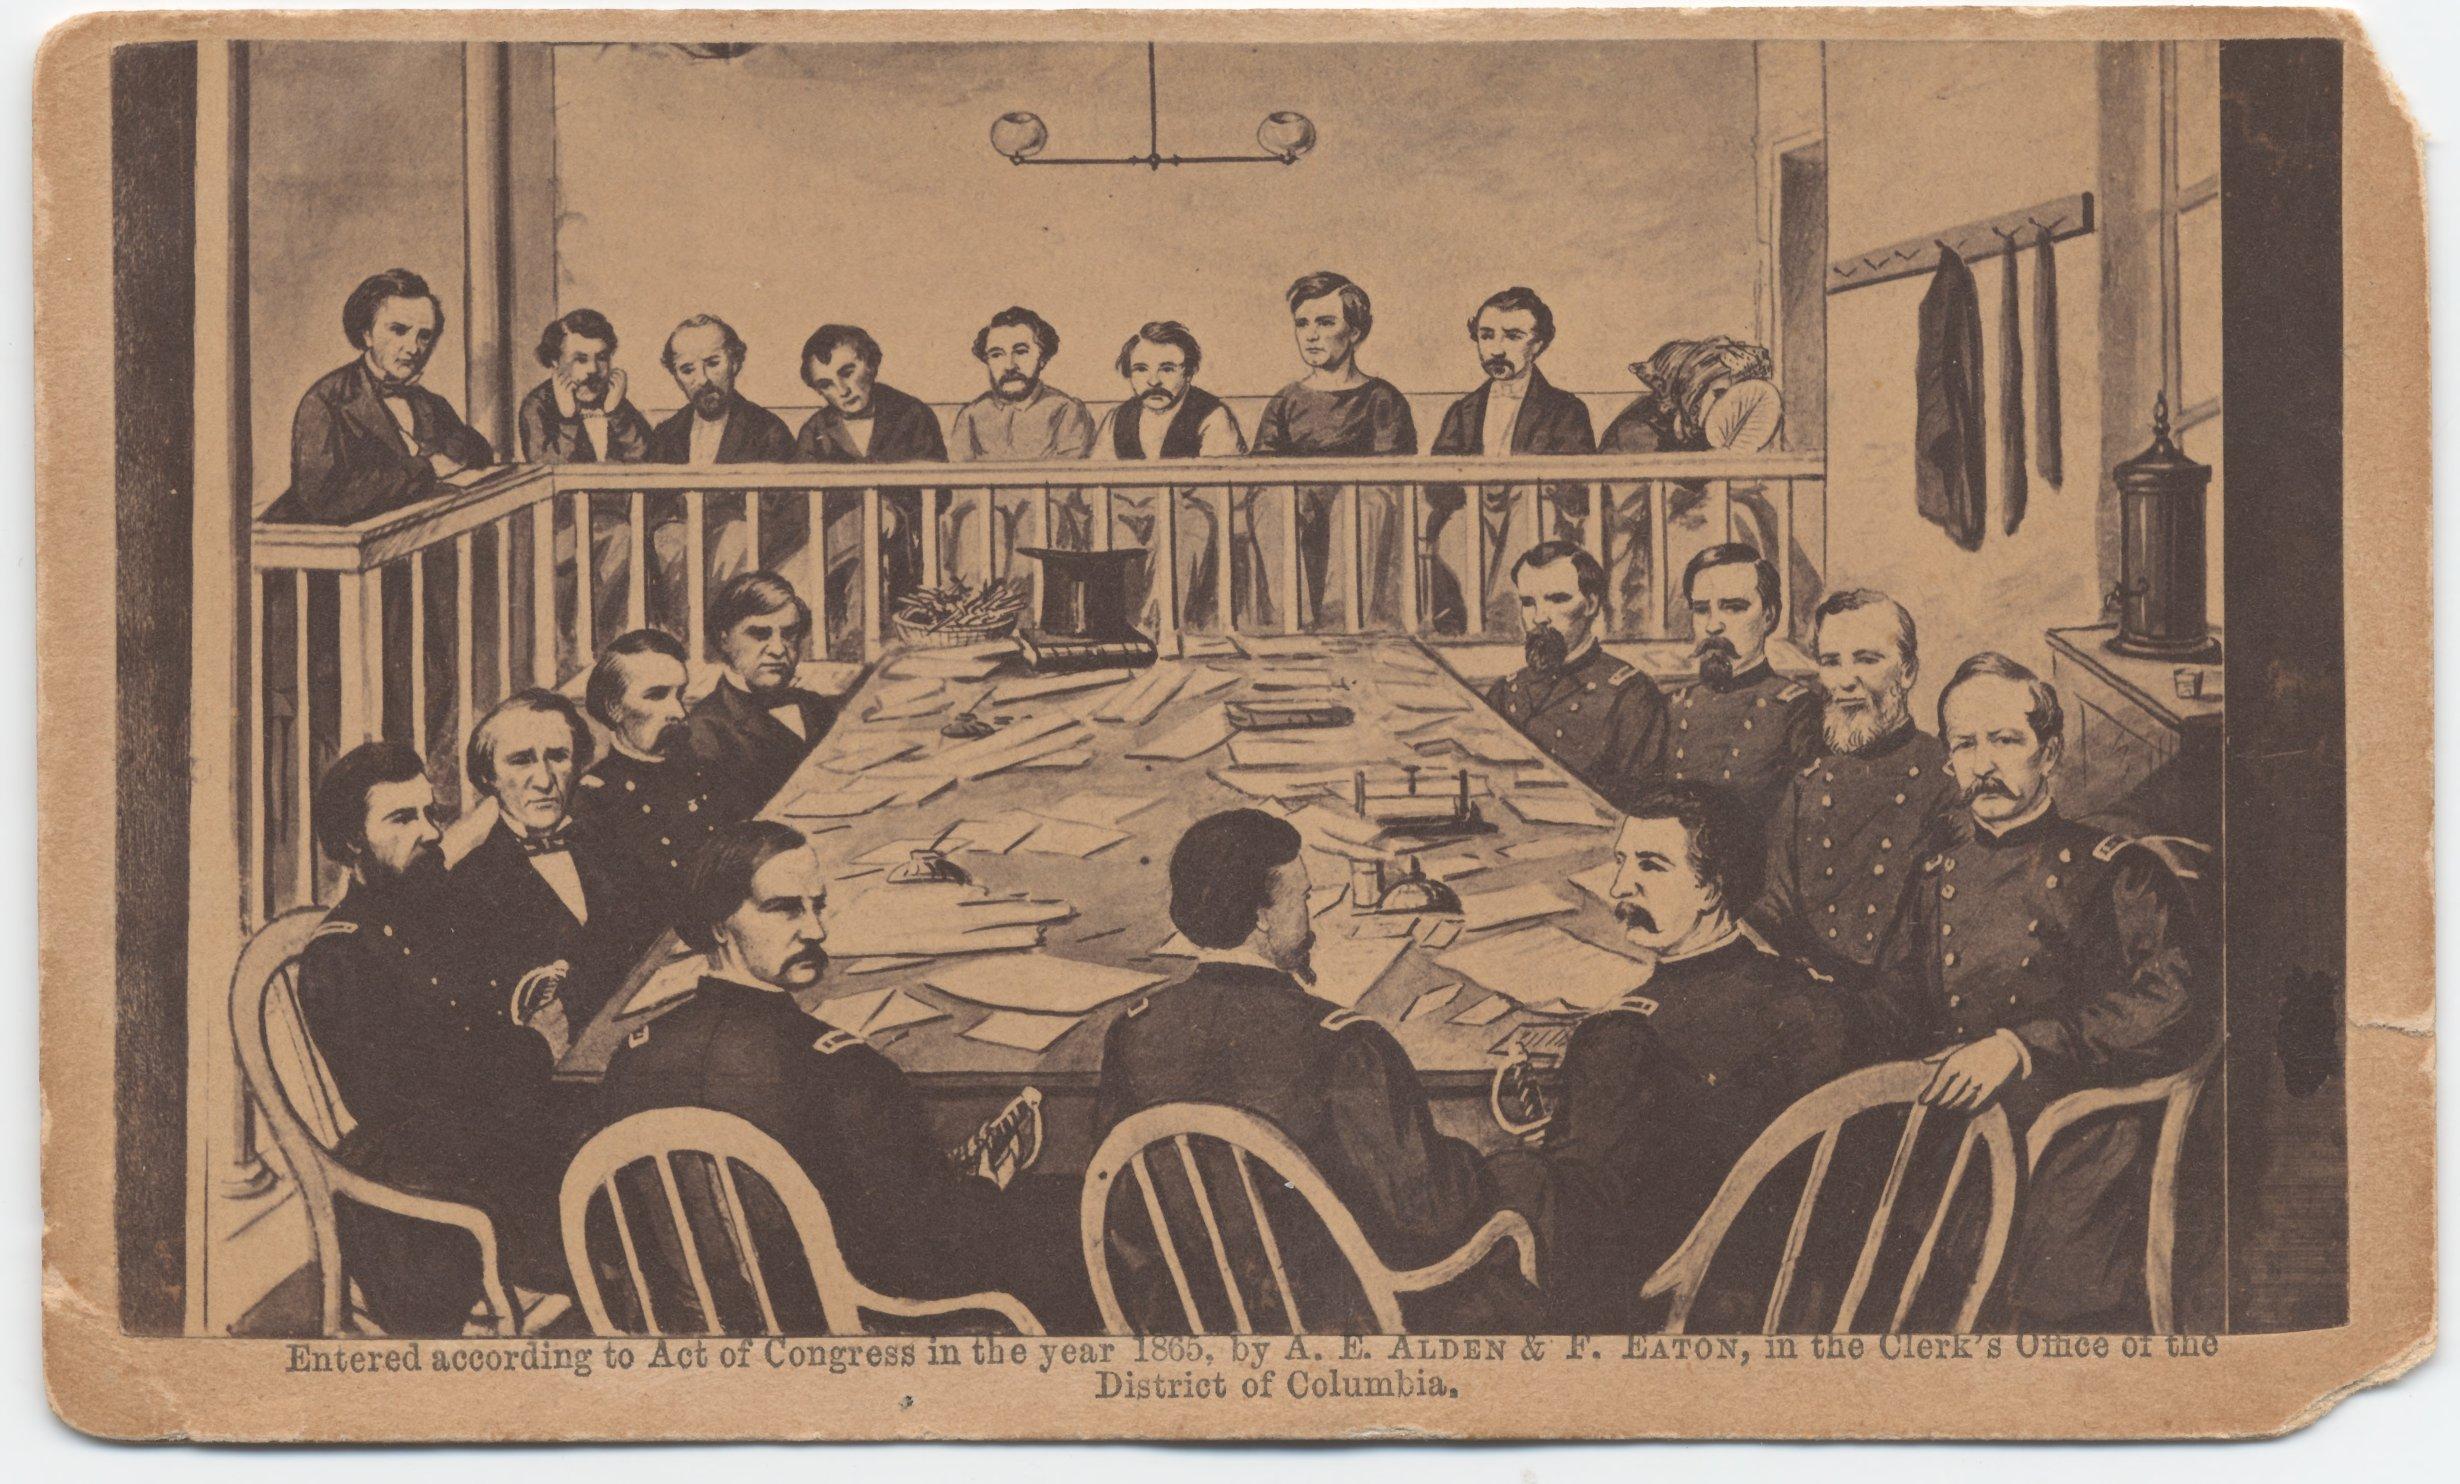 Trial of the conspirators, June 5, 1865